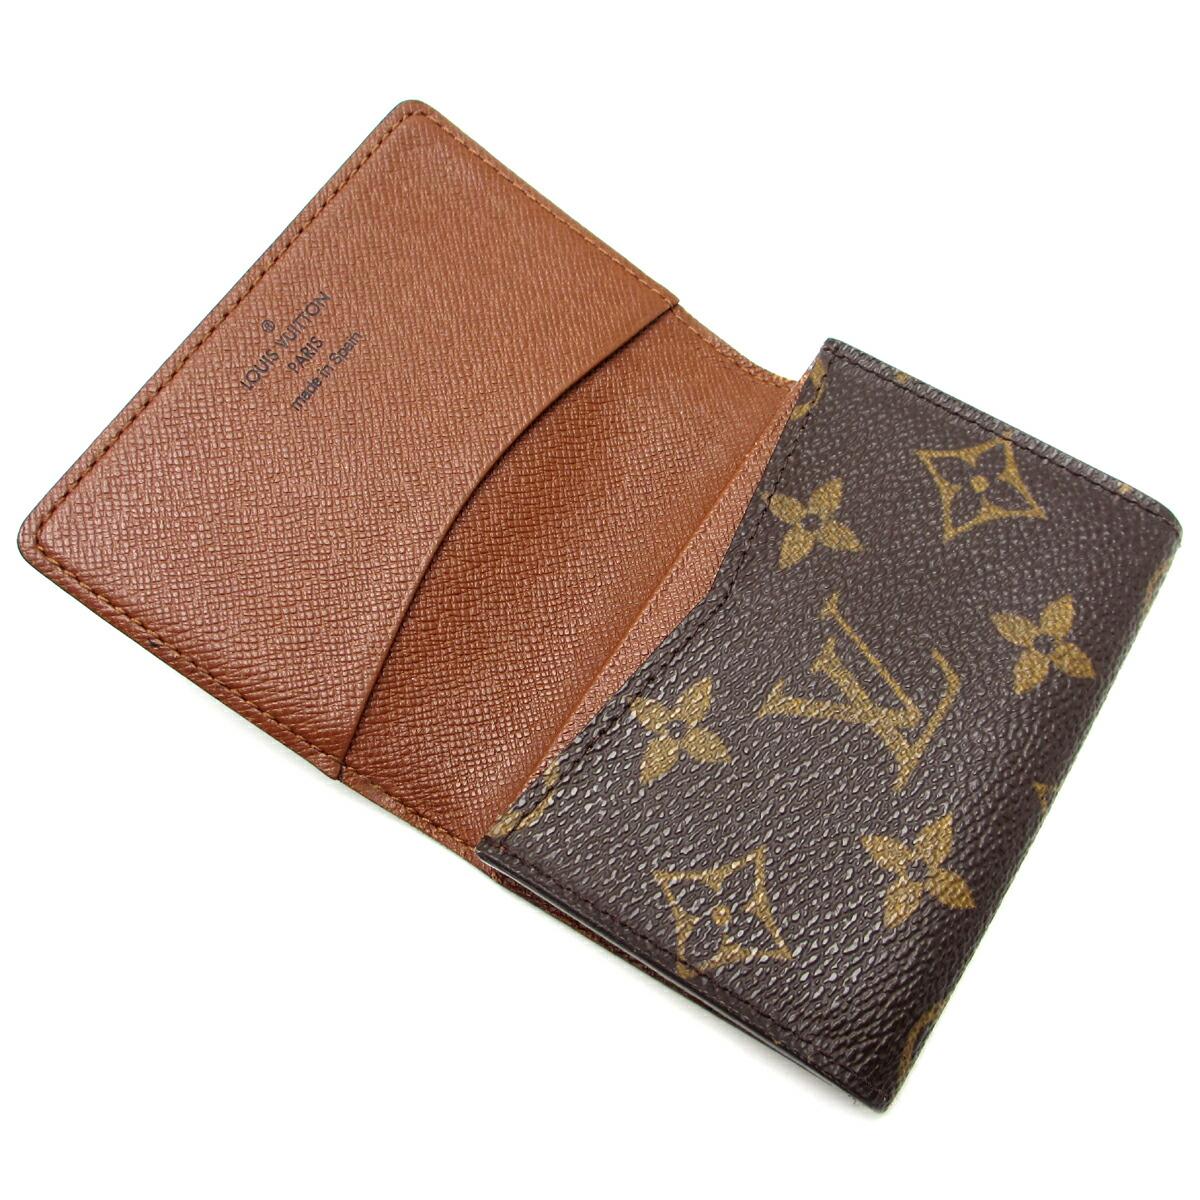 Auth Louis Vuitton Monogram Canvas Business Card Holder M62920 (DH44689)   eBay